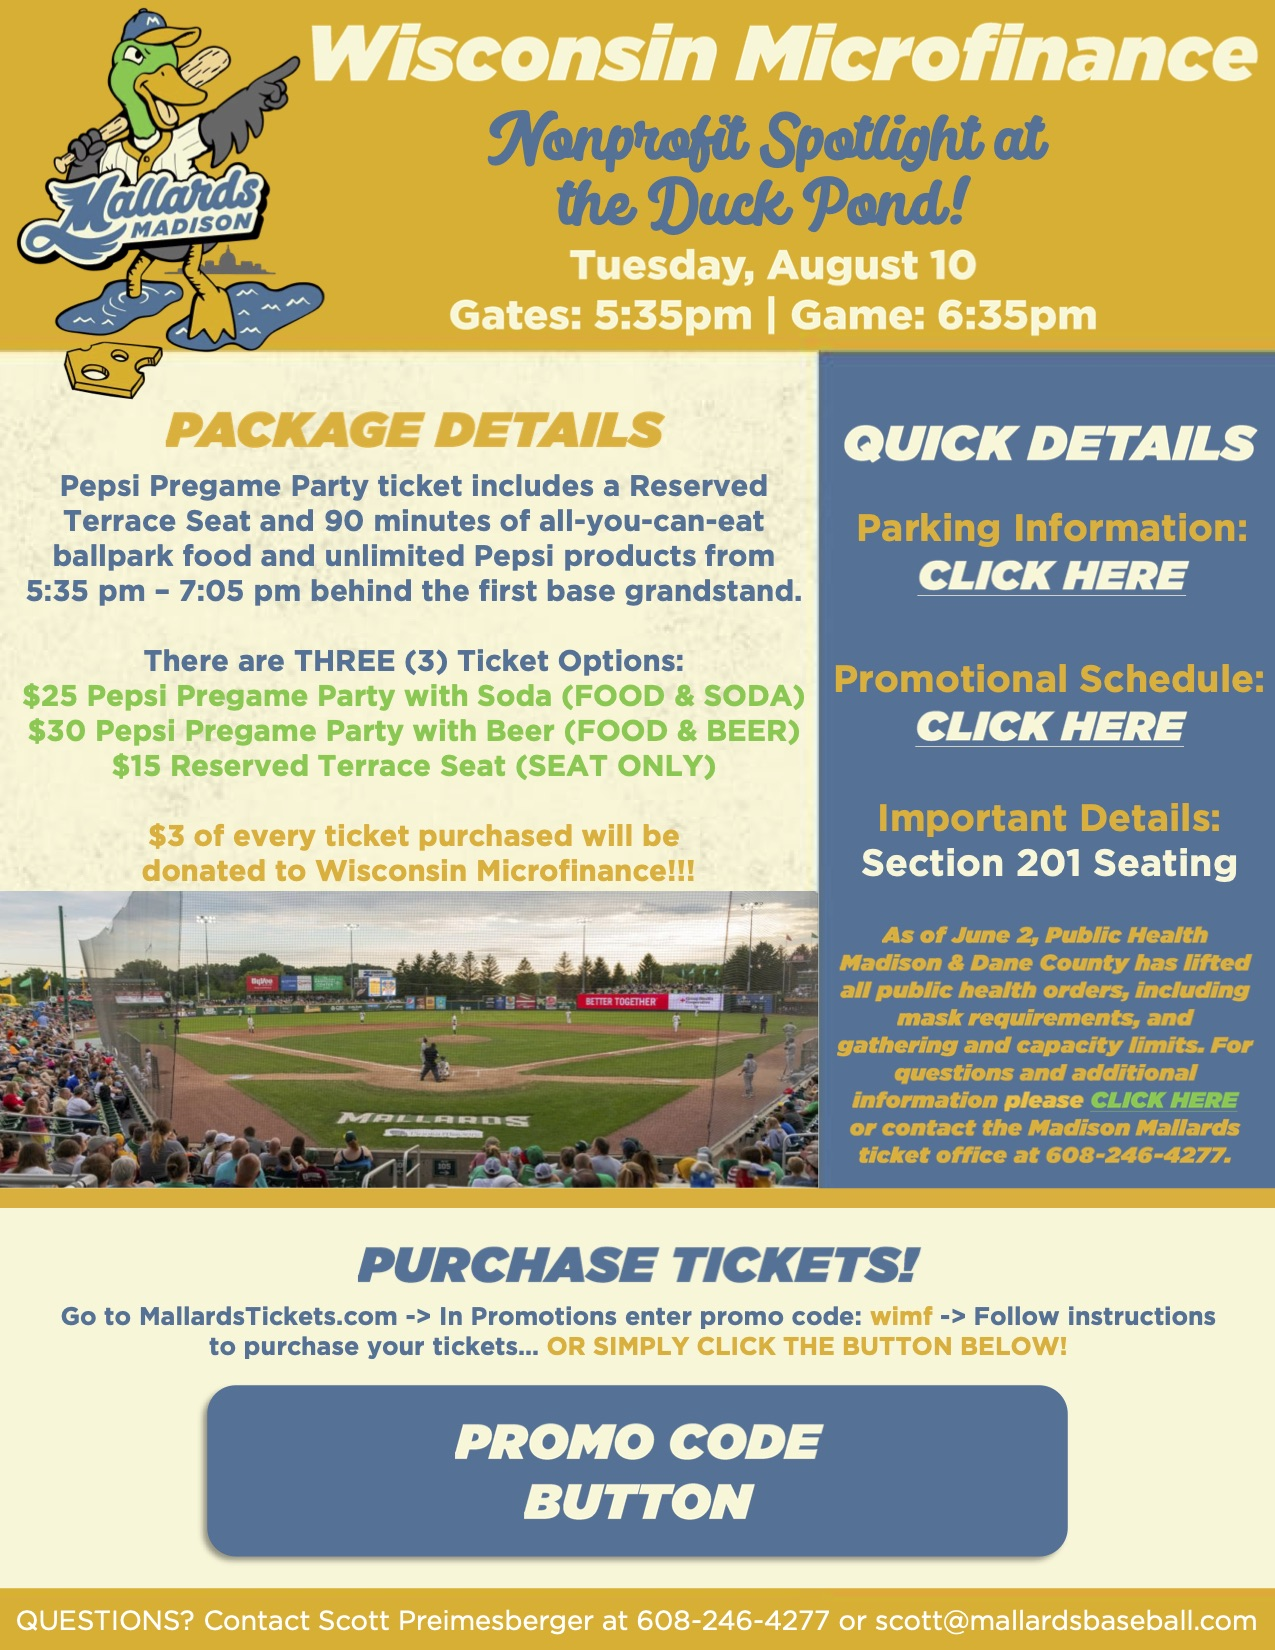 Wisconsin Microfinance - August 10 Group Portal Flyer (2)